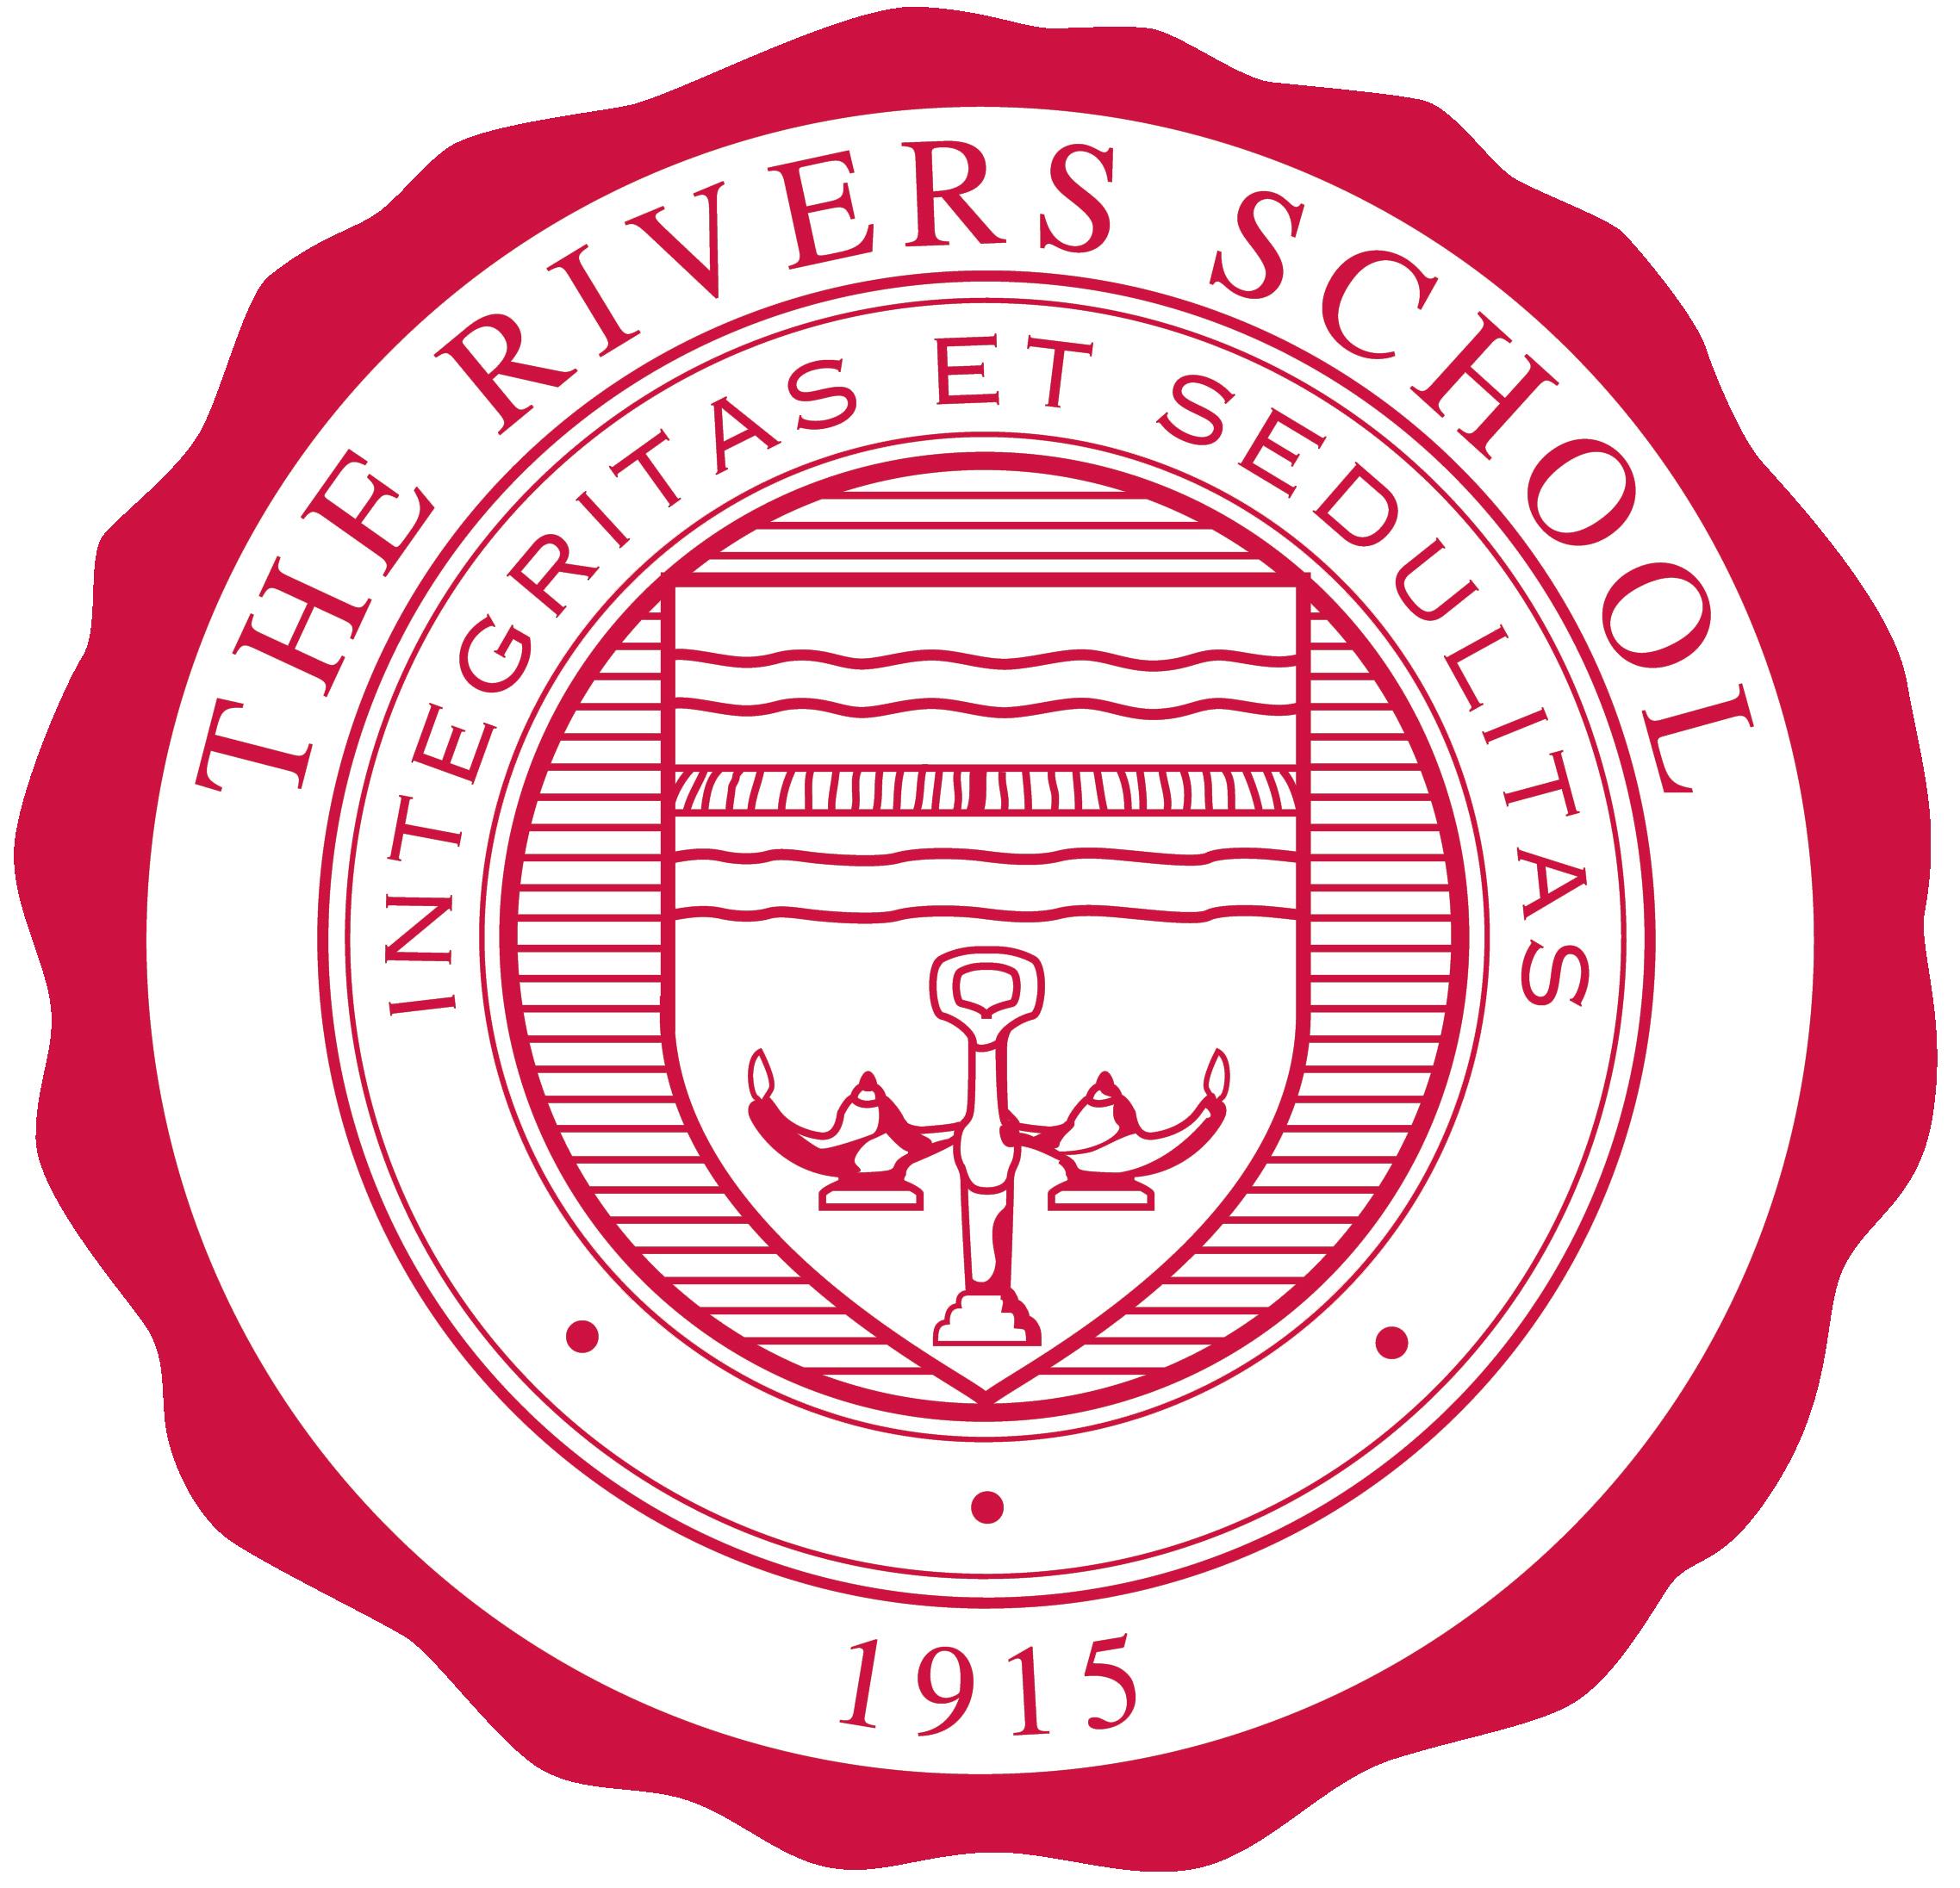 The Rivers School